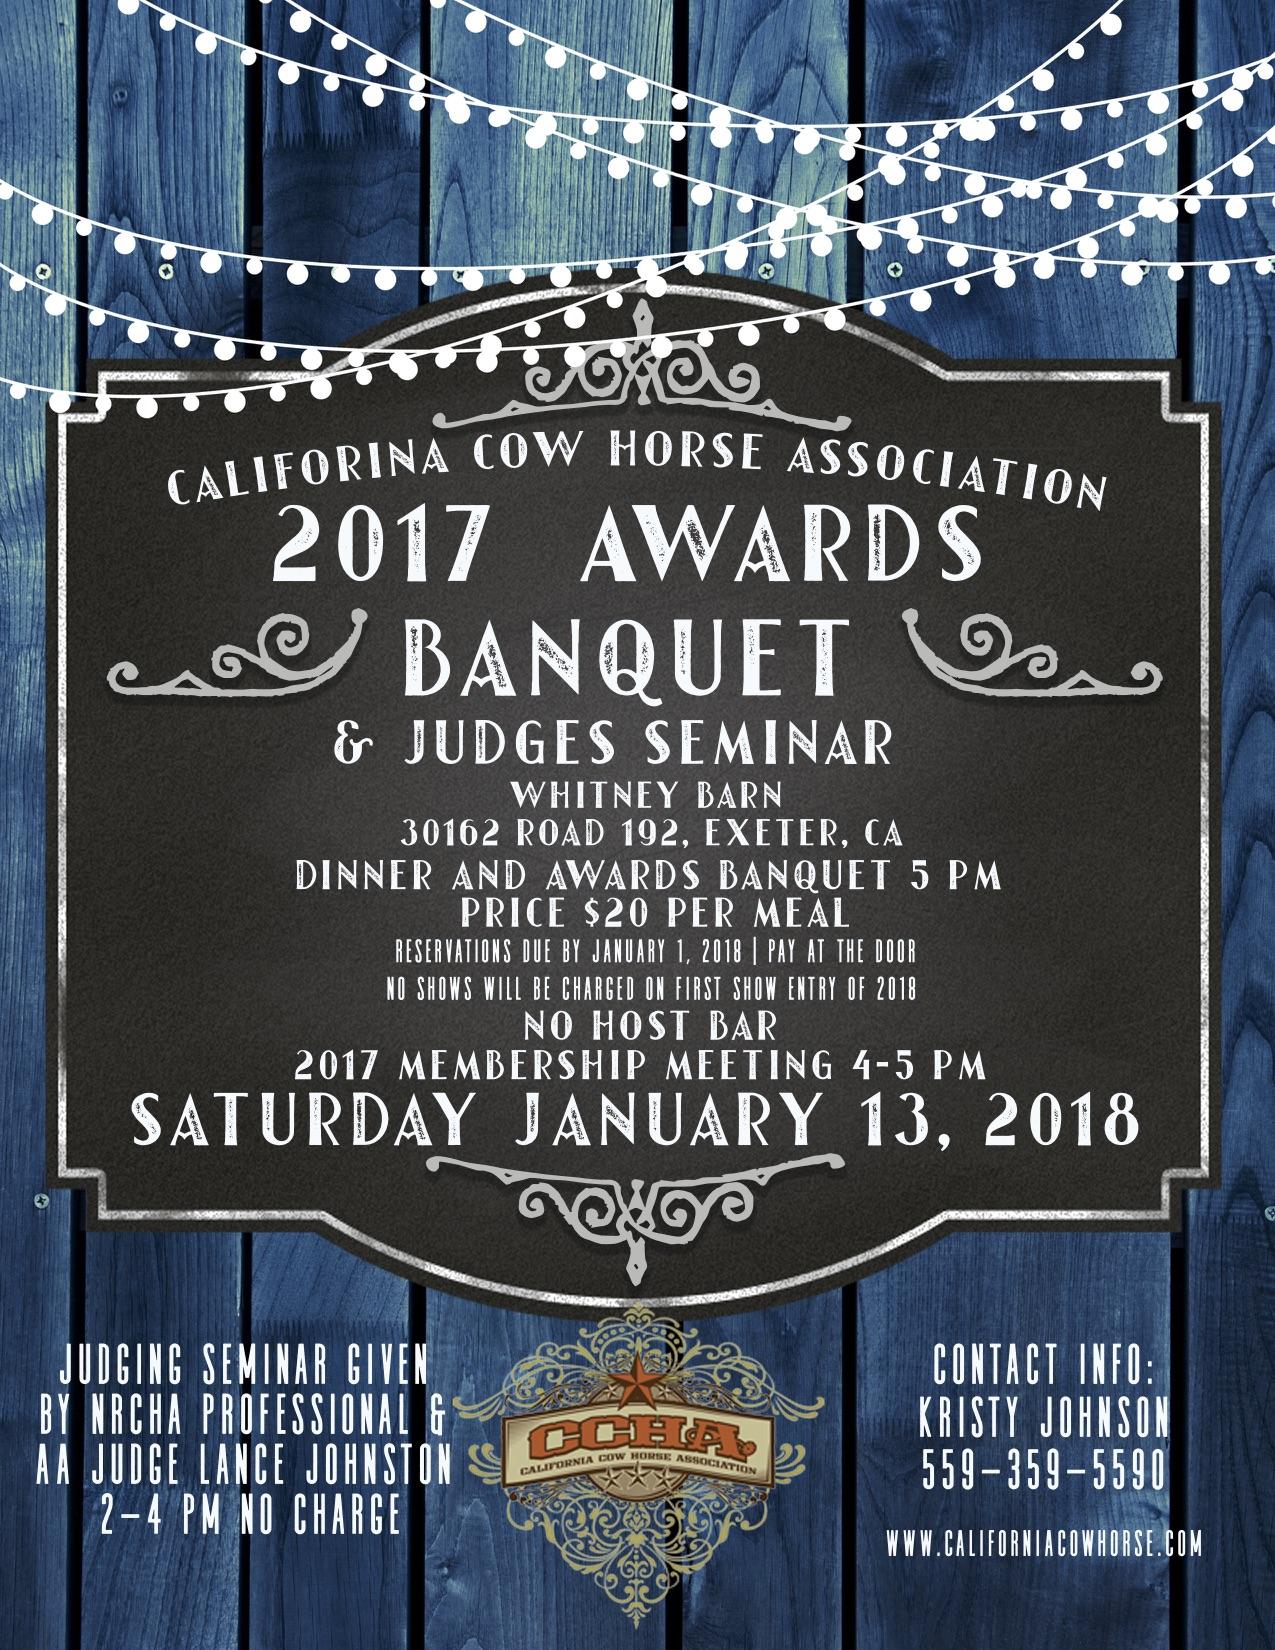 2017 Awards Banquet Poster